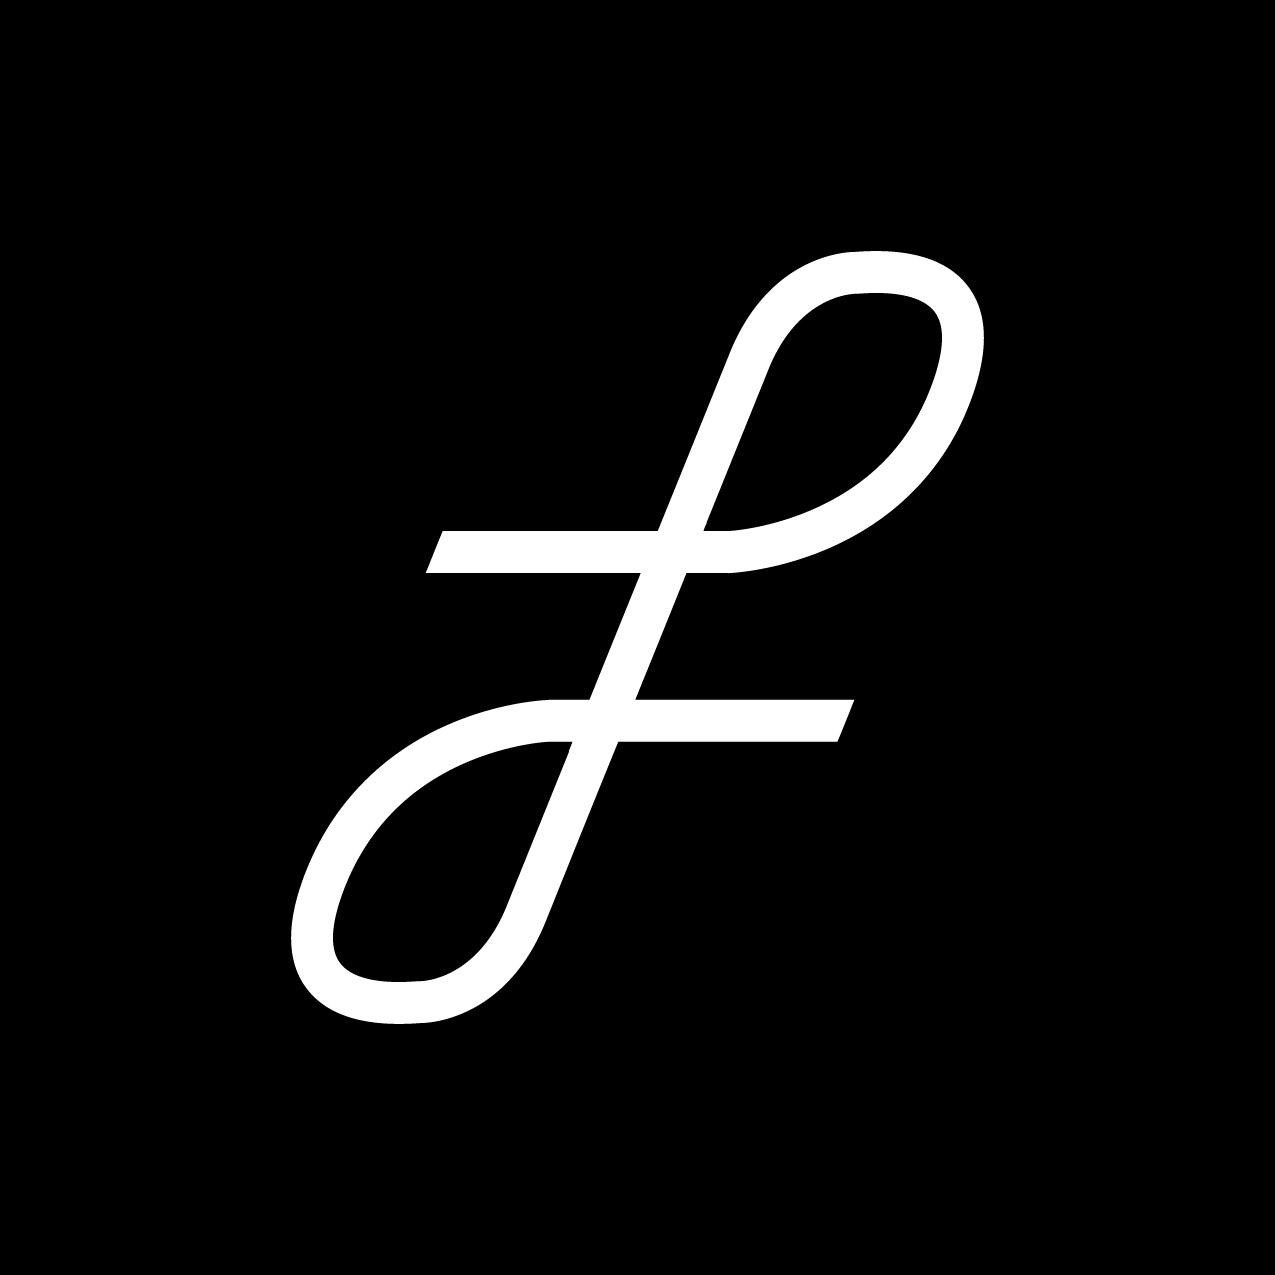 Letter F2 design by Furia